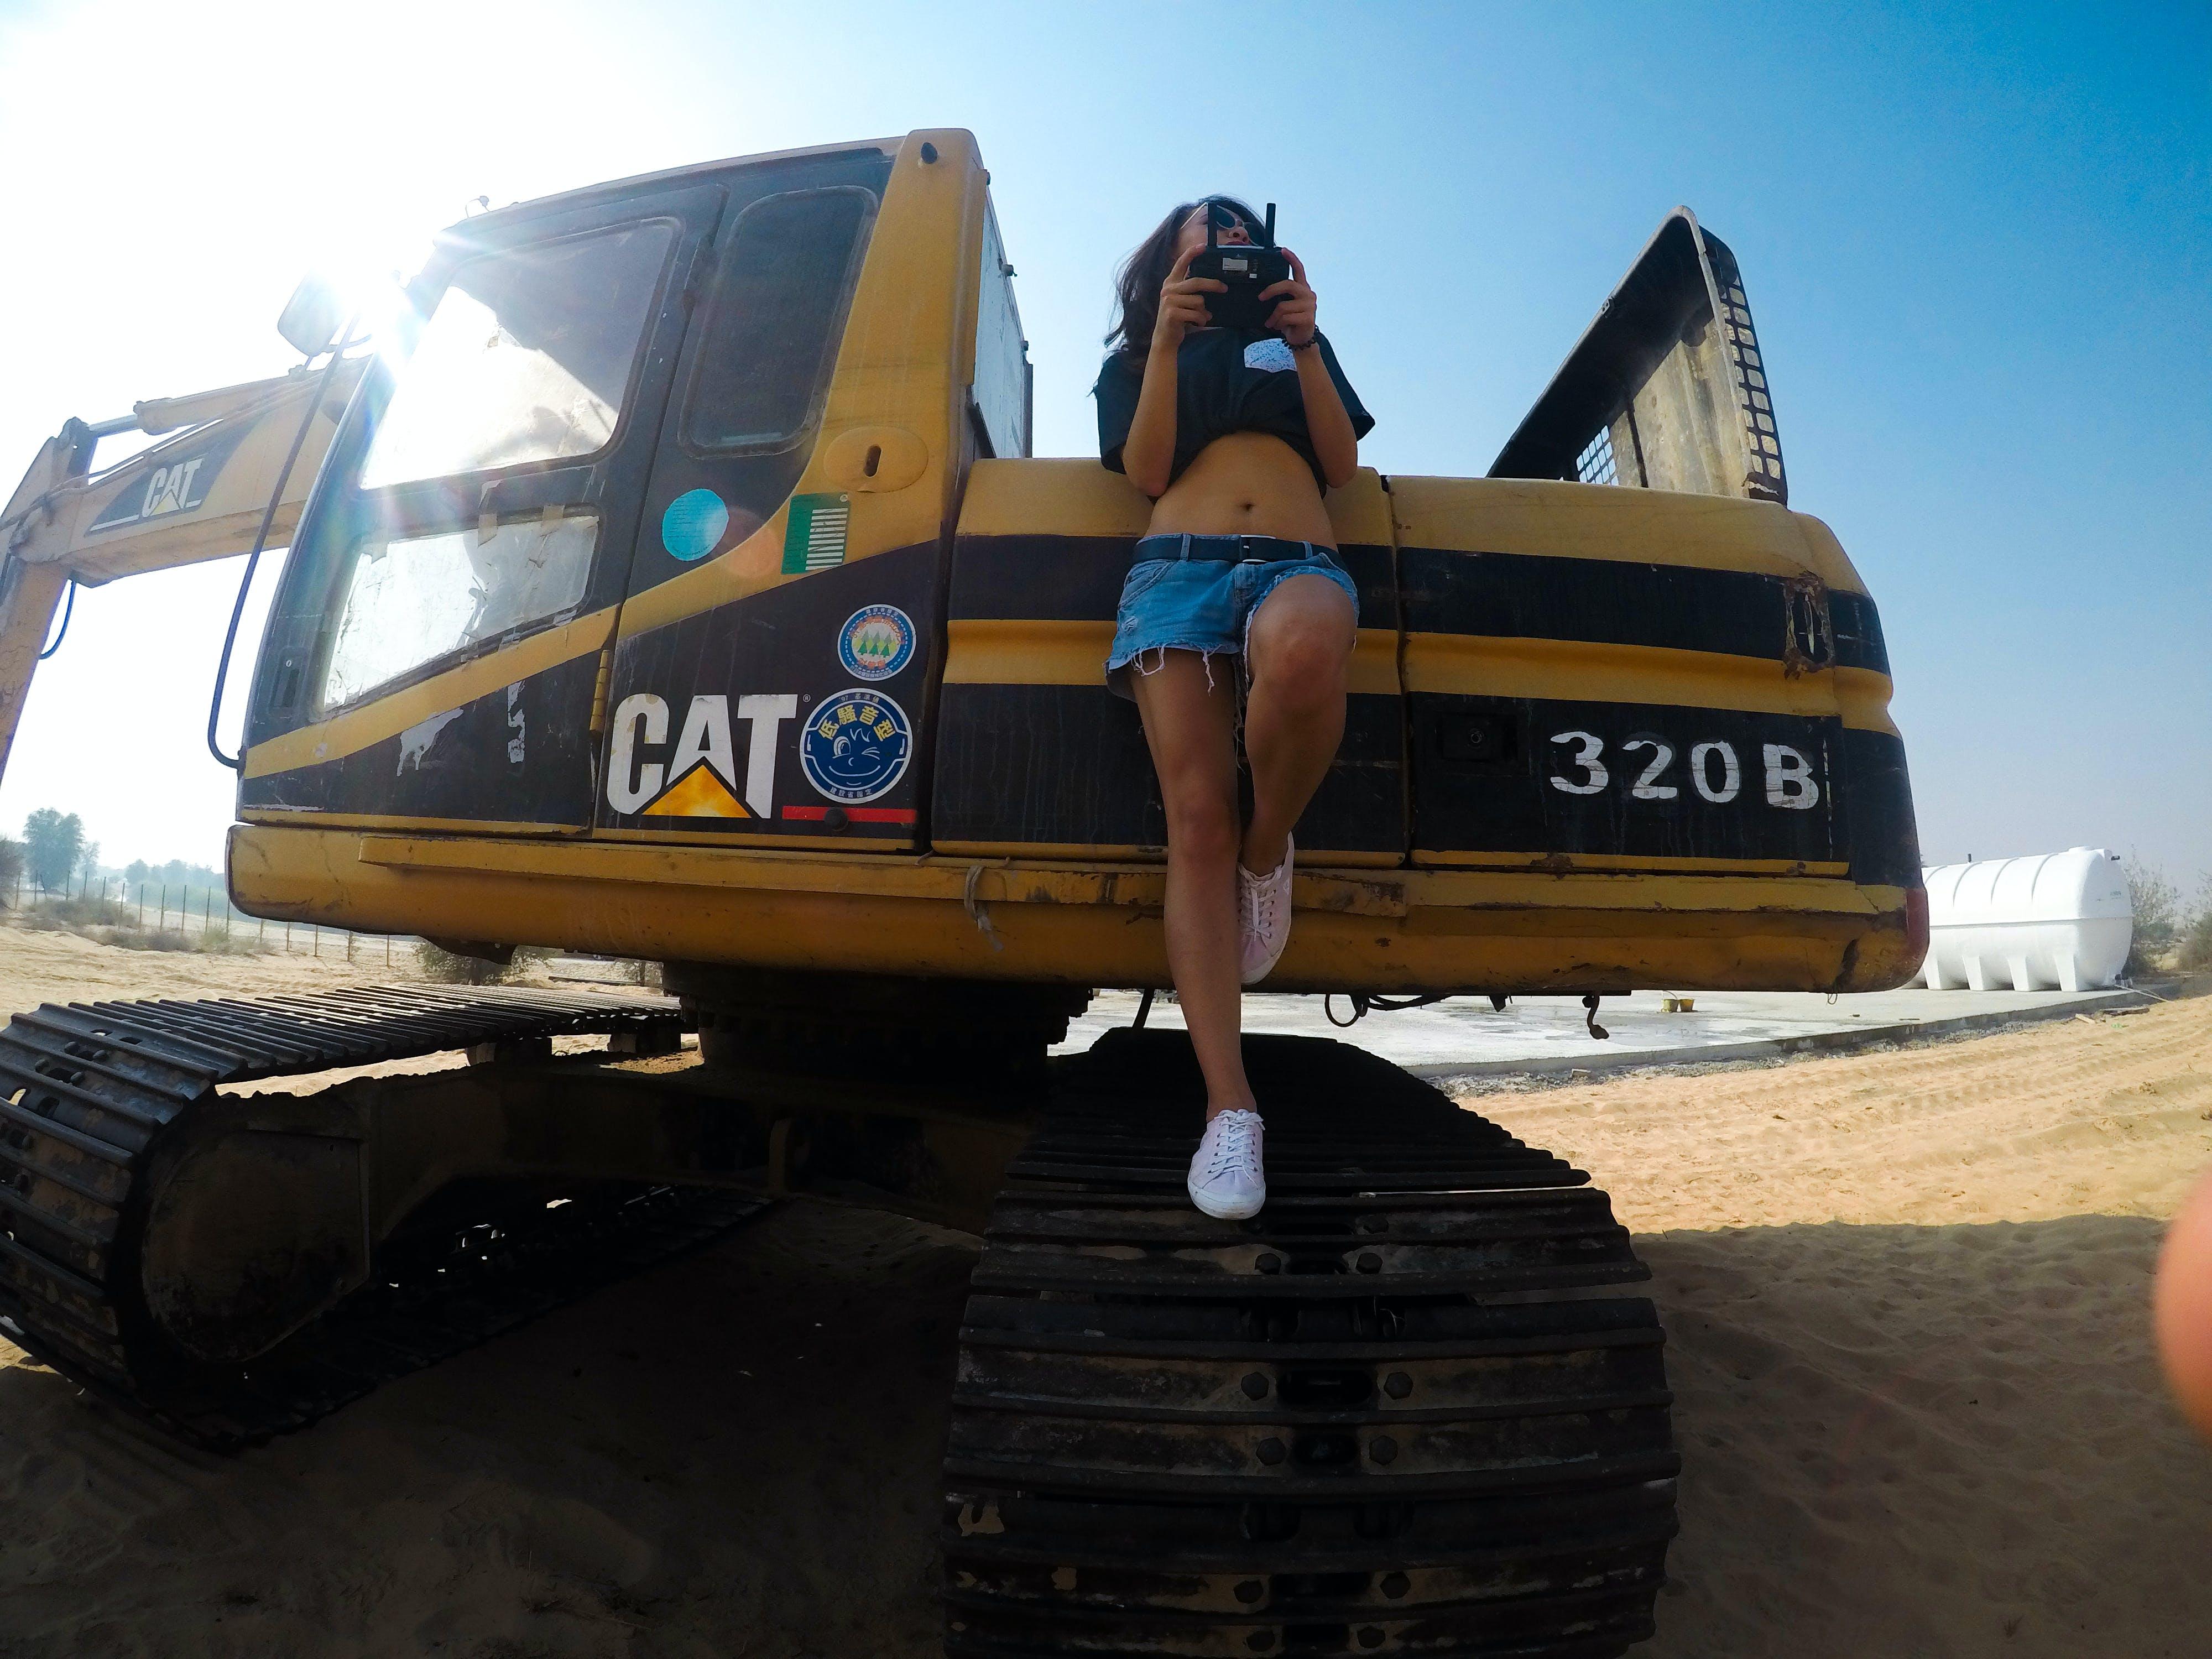 Woman Standing on Cat 320b Excavator